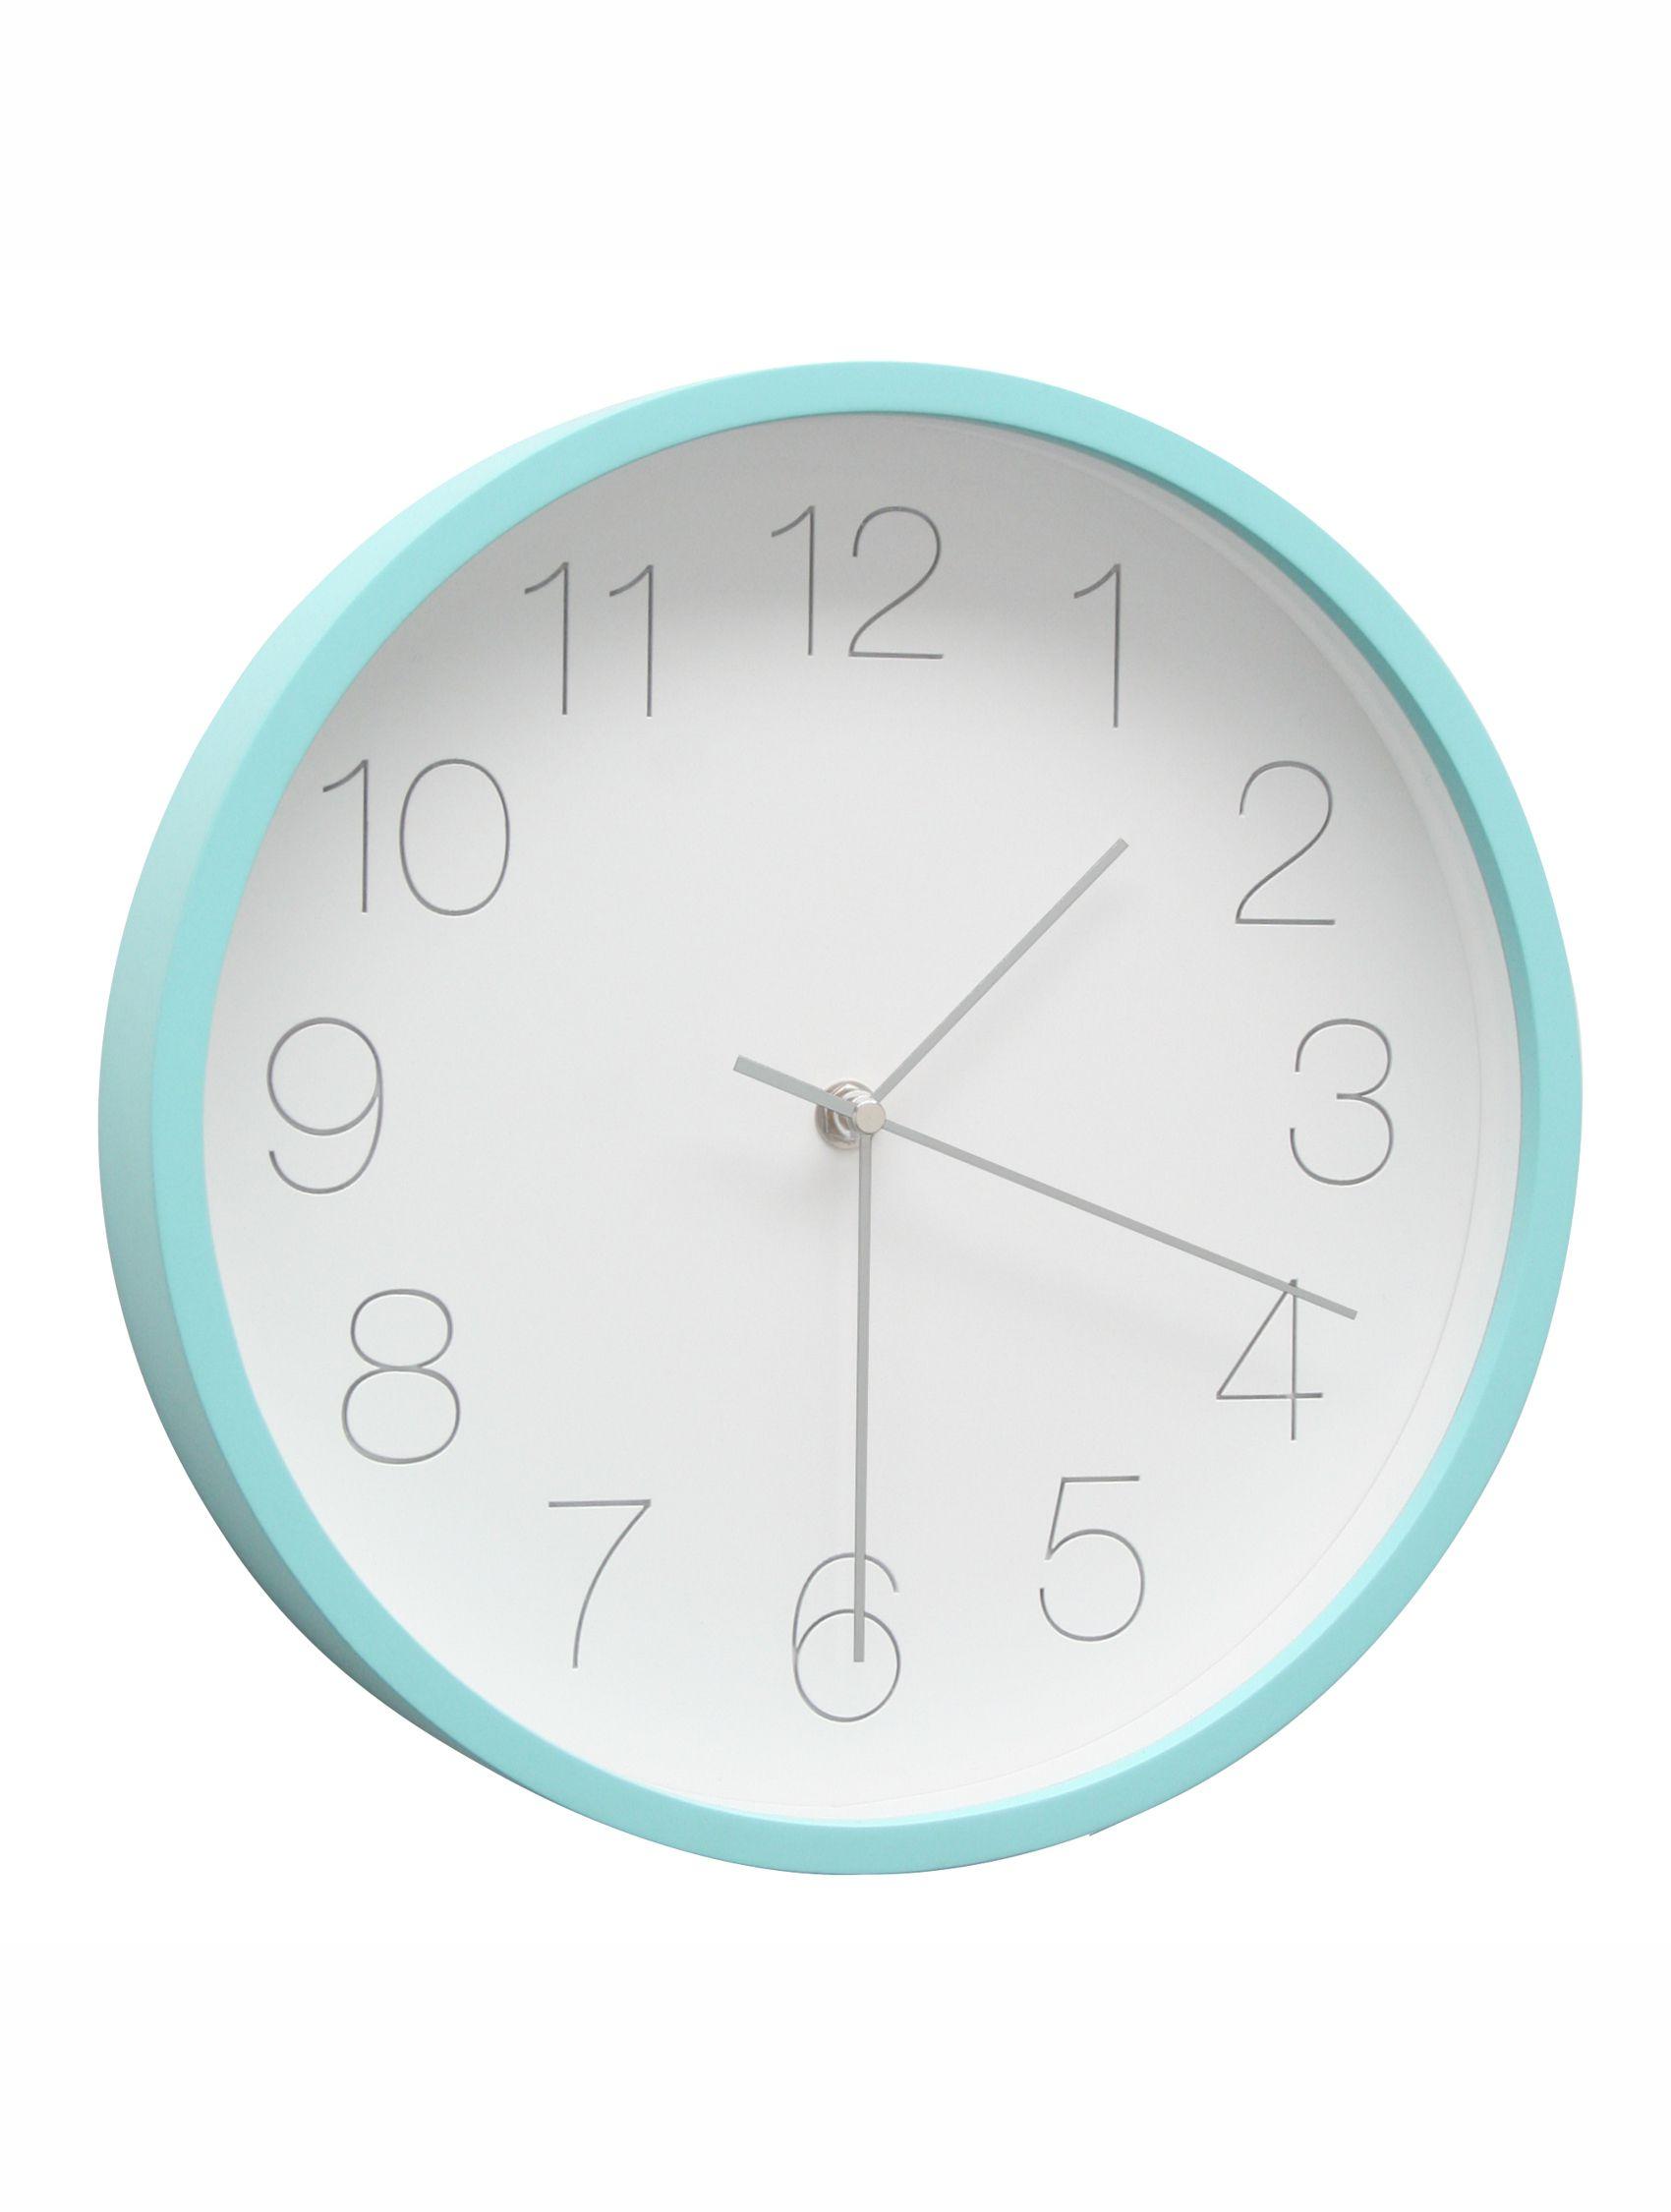 Klok met blauwe rand, rond, 30cm diam. K102K6 CL